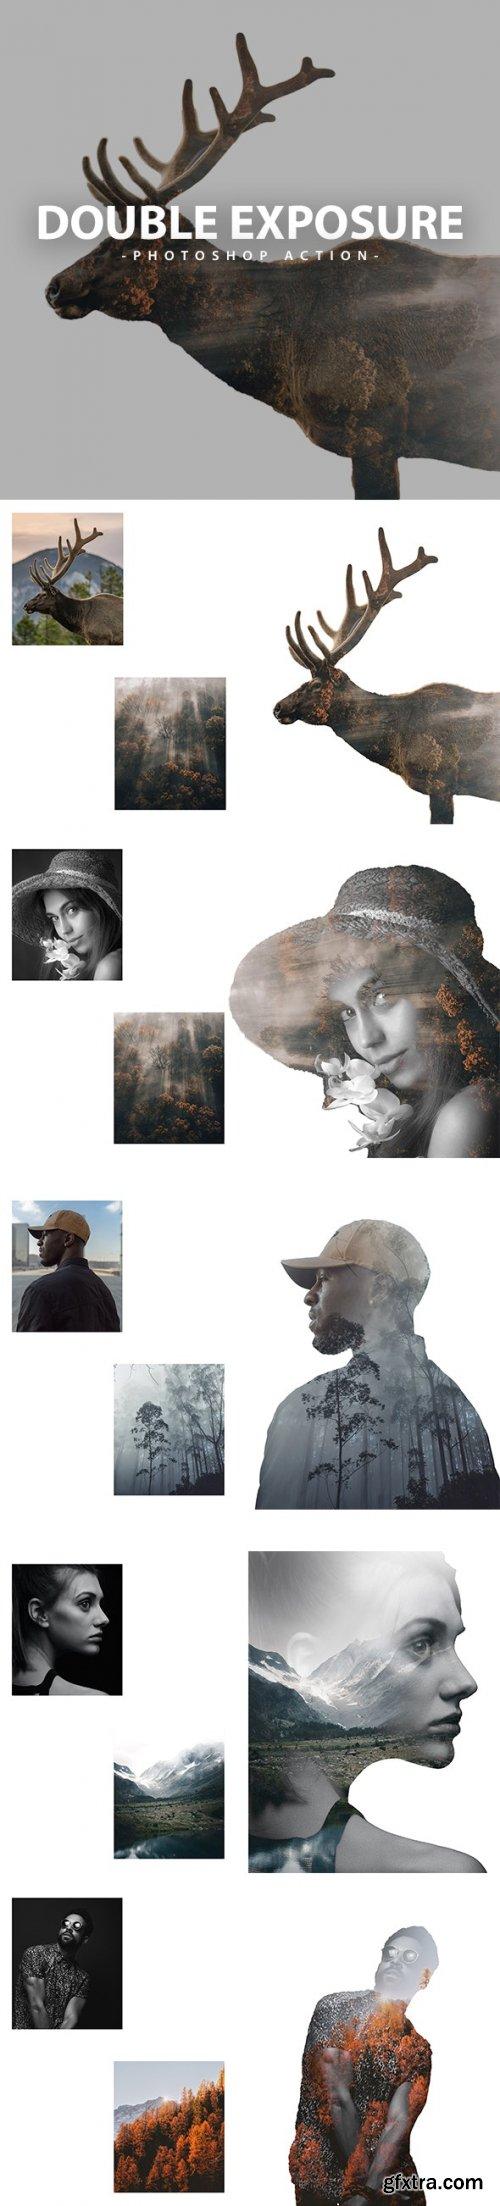 GraphicRiver - Double Exposure Photoshop Action 32912086